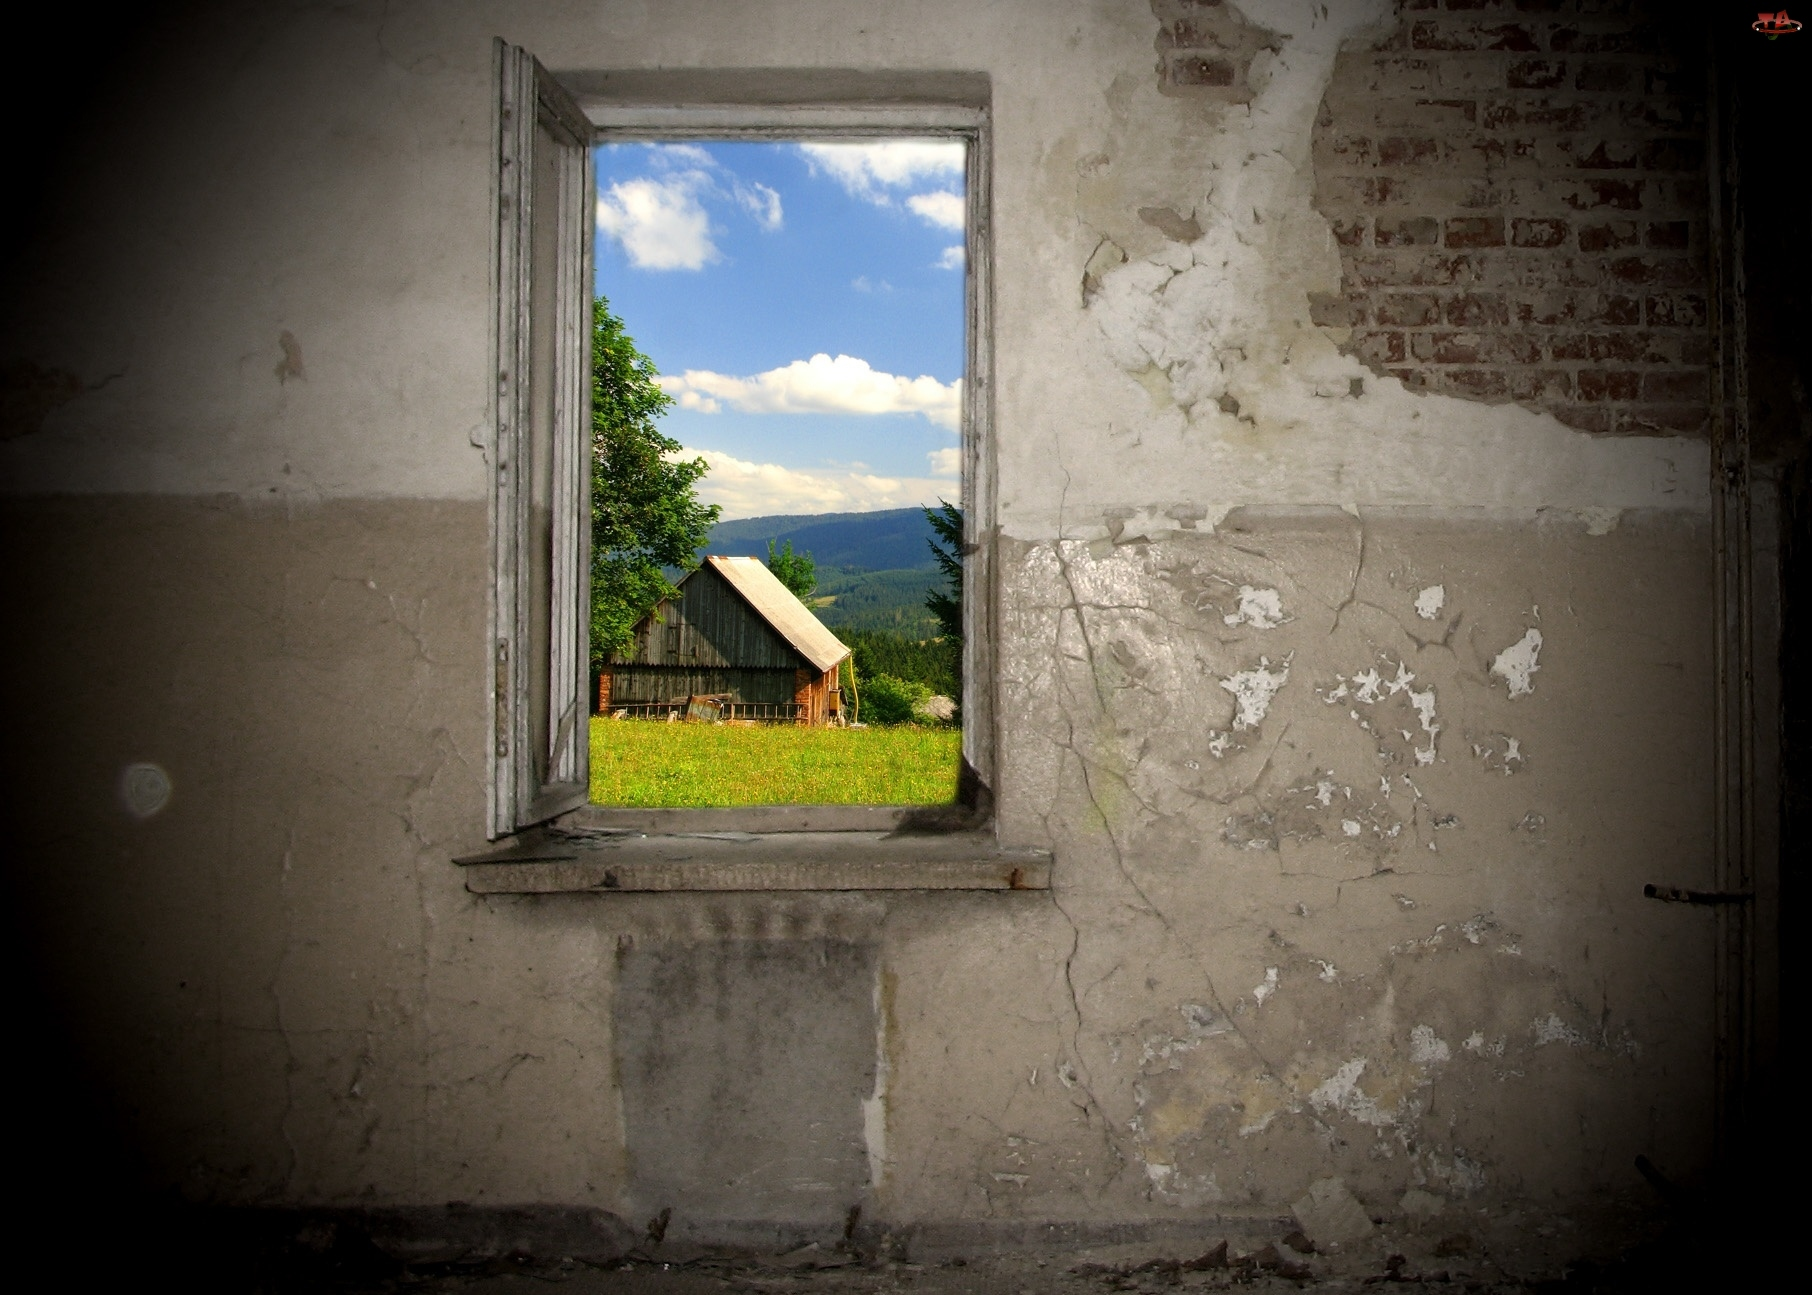 Krajobraz, Dom, Okno